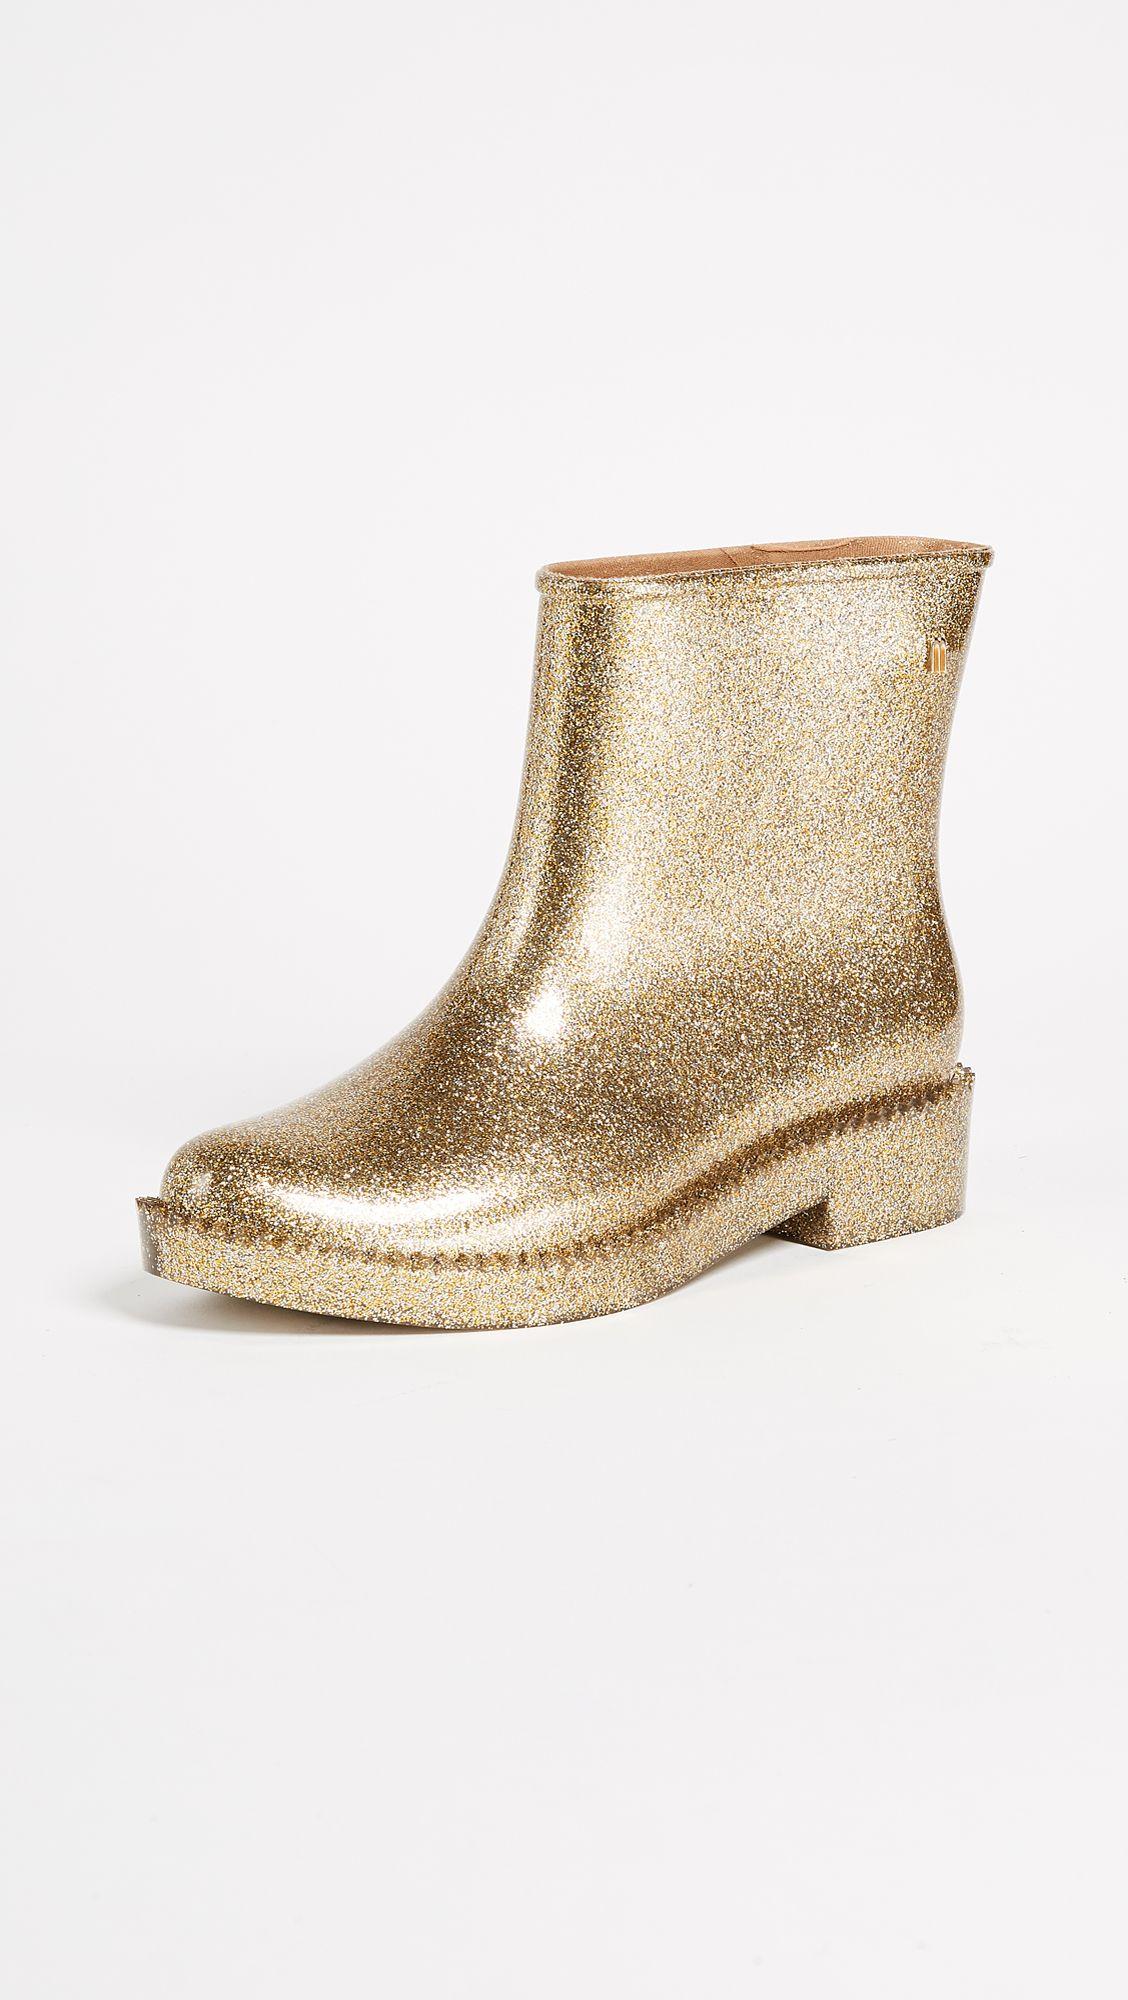 8504524bb1 Melissa Drop Rain Boots, #ad | Items I like | Rain boots, Boots ...